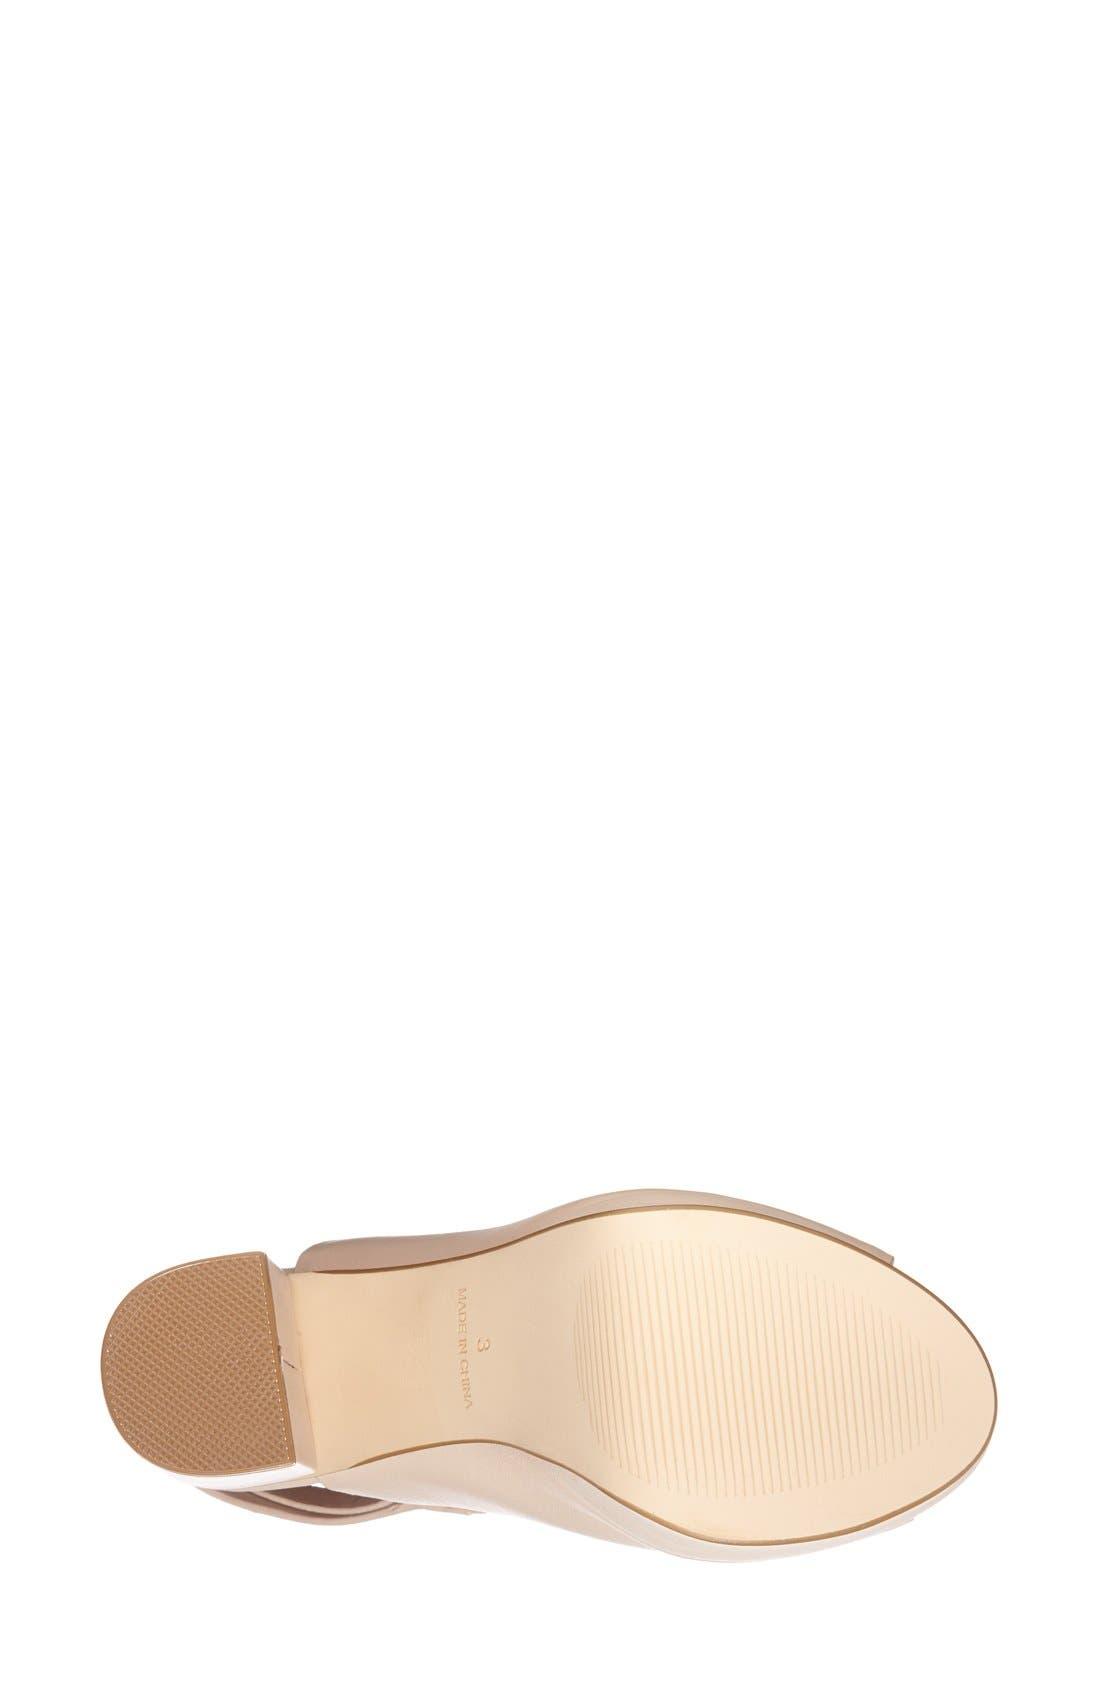 Alternate Image 3  - Topshop 'Sagittarius' Leather Ankle Strap Open Toe Platform Sandal (Women)